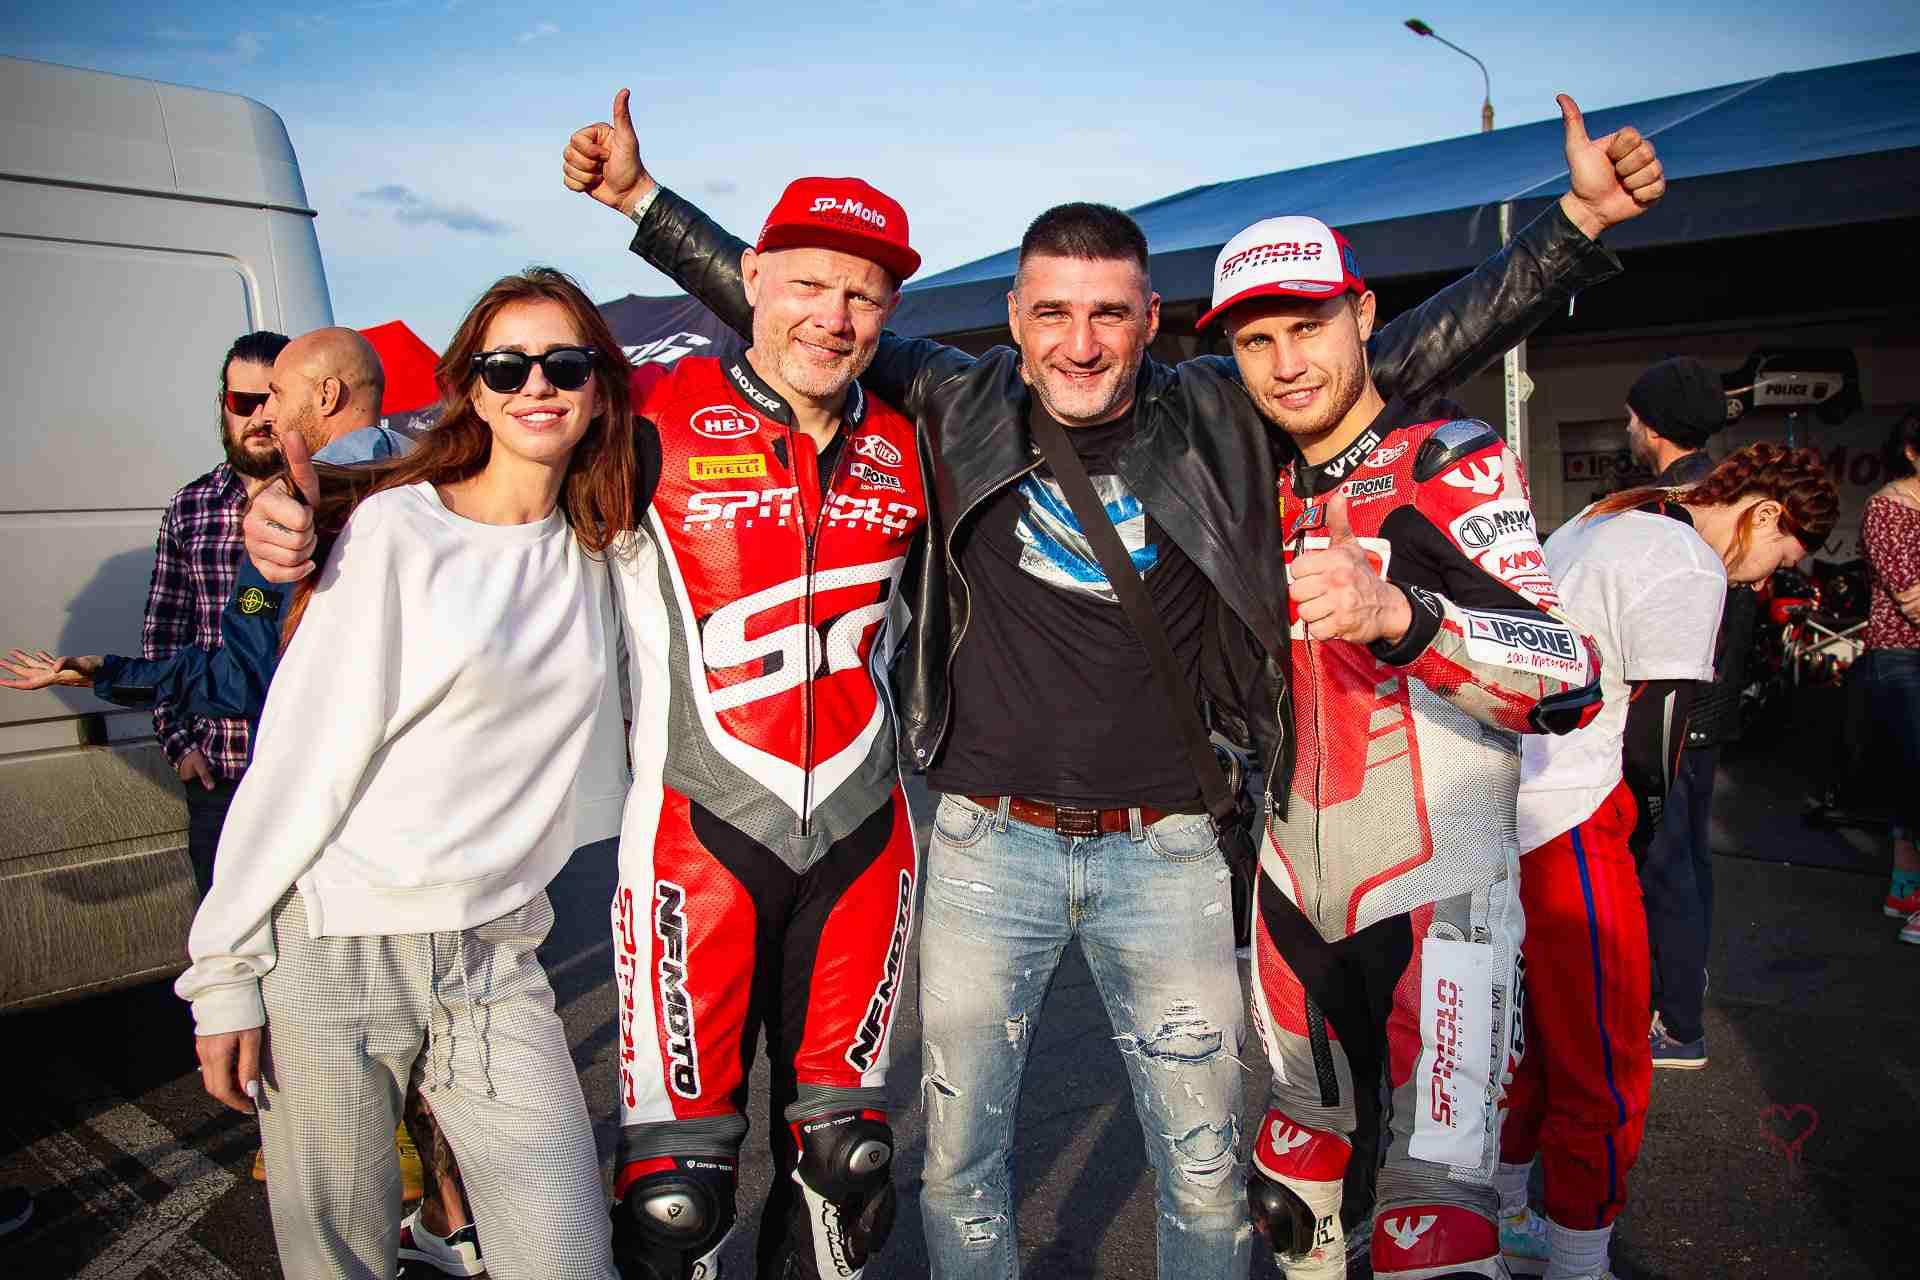 5-6_etap_MotoGPUkraine_108